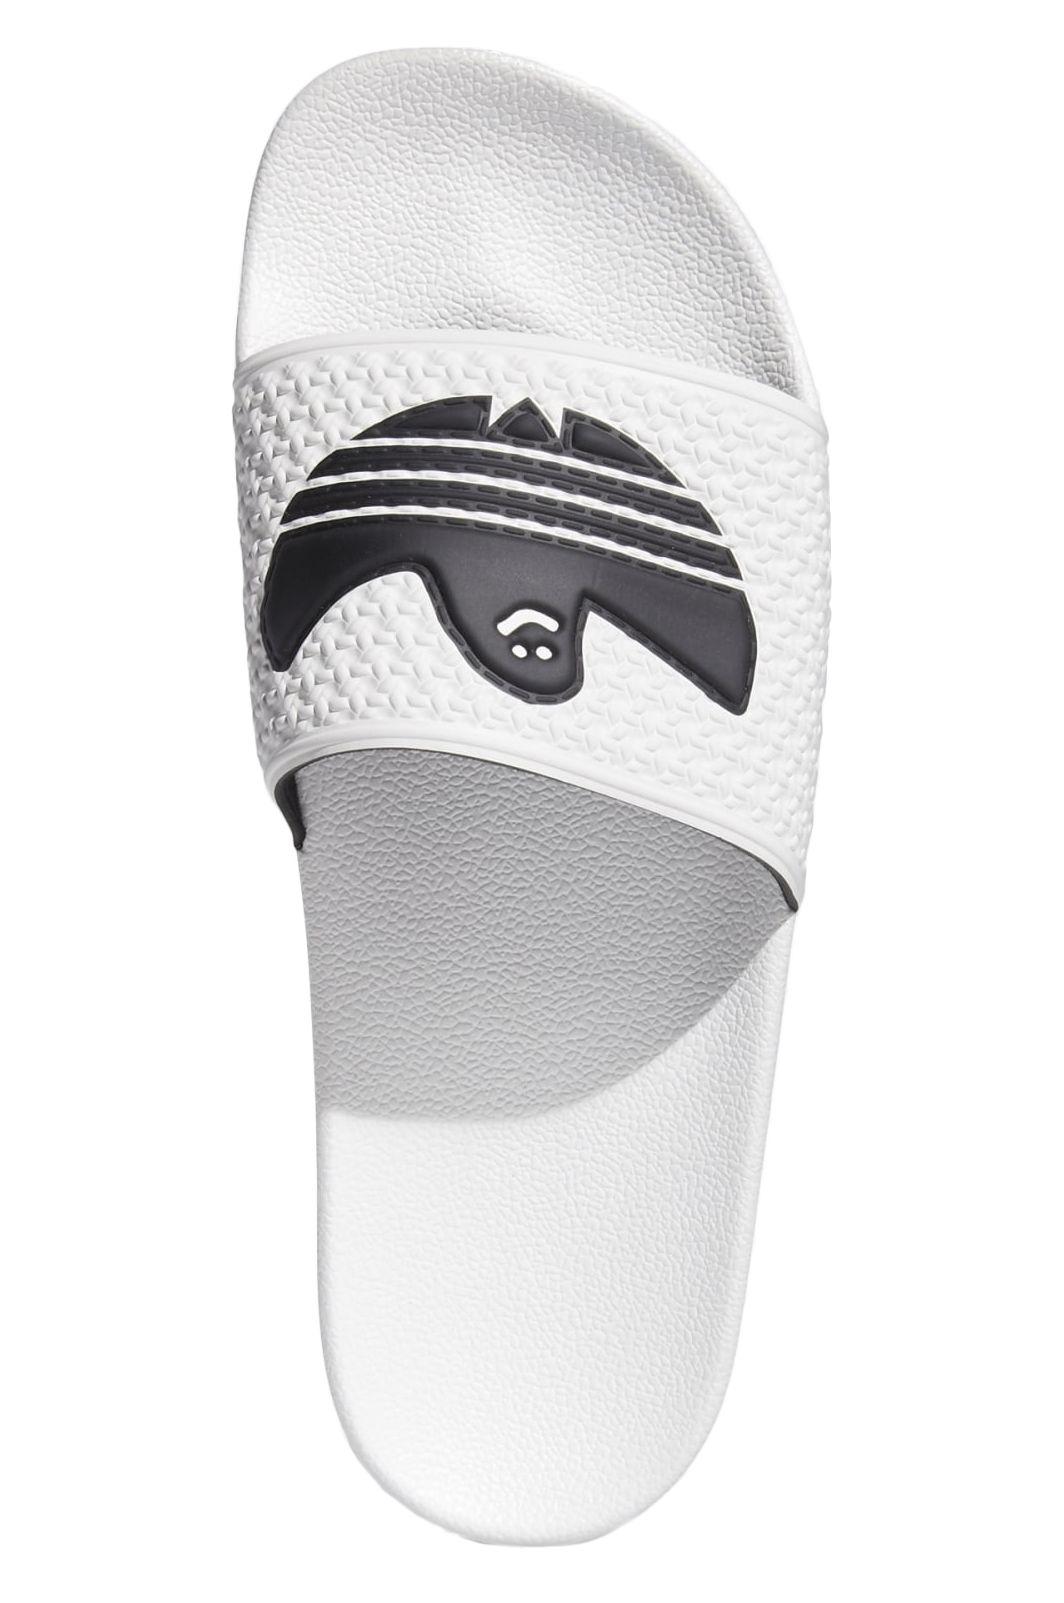 Chinelos Adidas SHMOOFOIL SLIDE Ftwr White/Core Black/Ftwr White